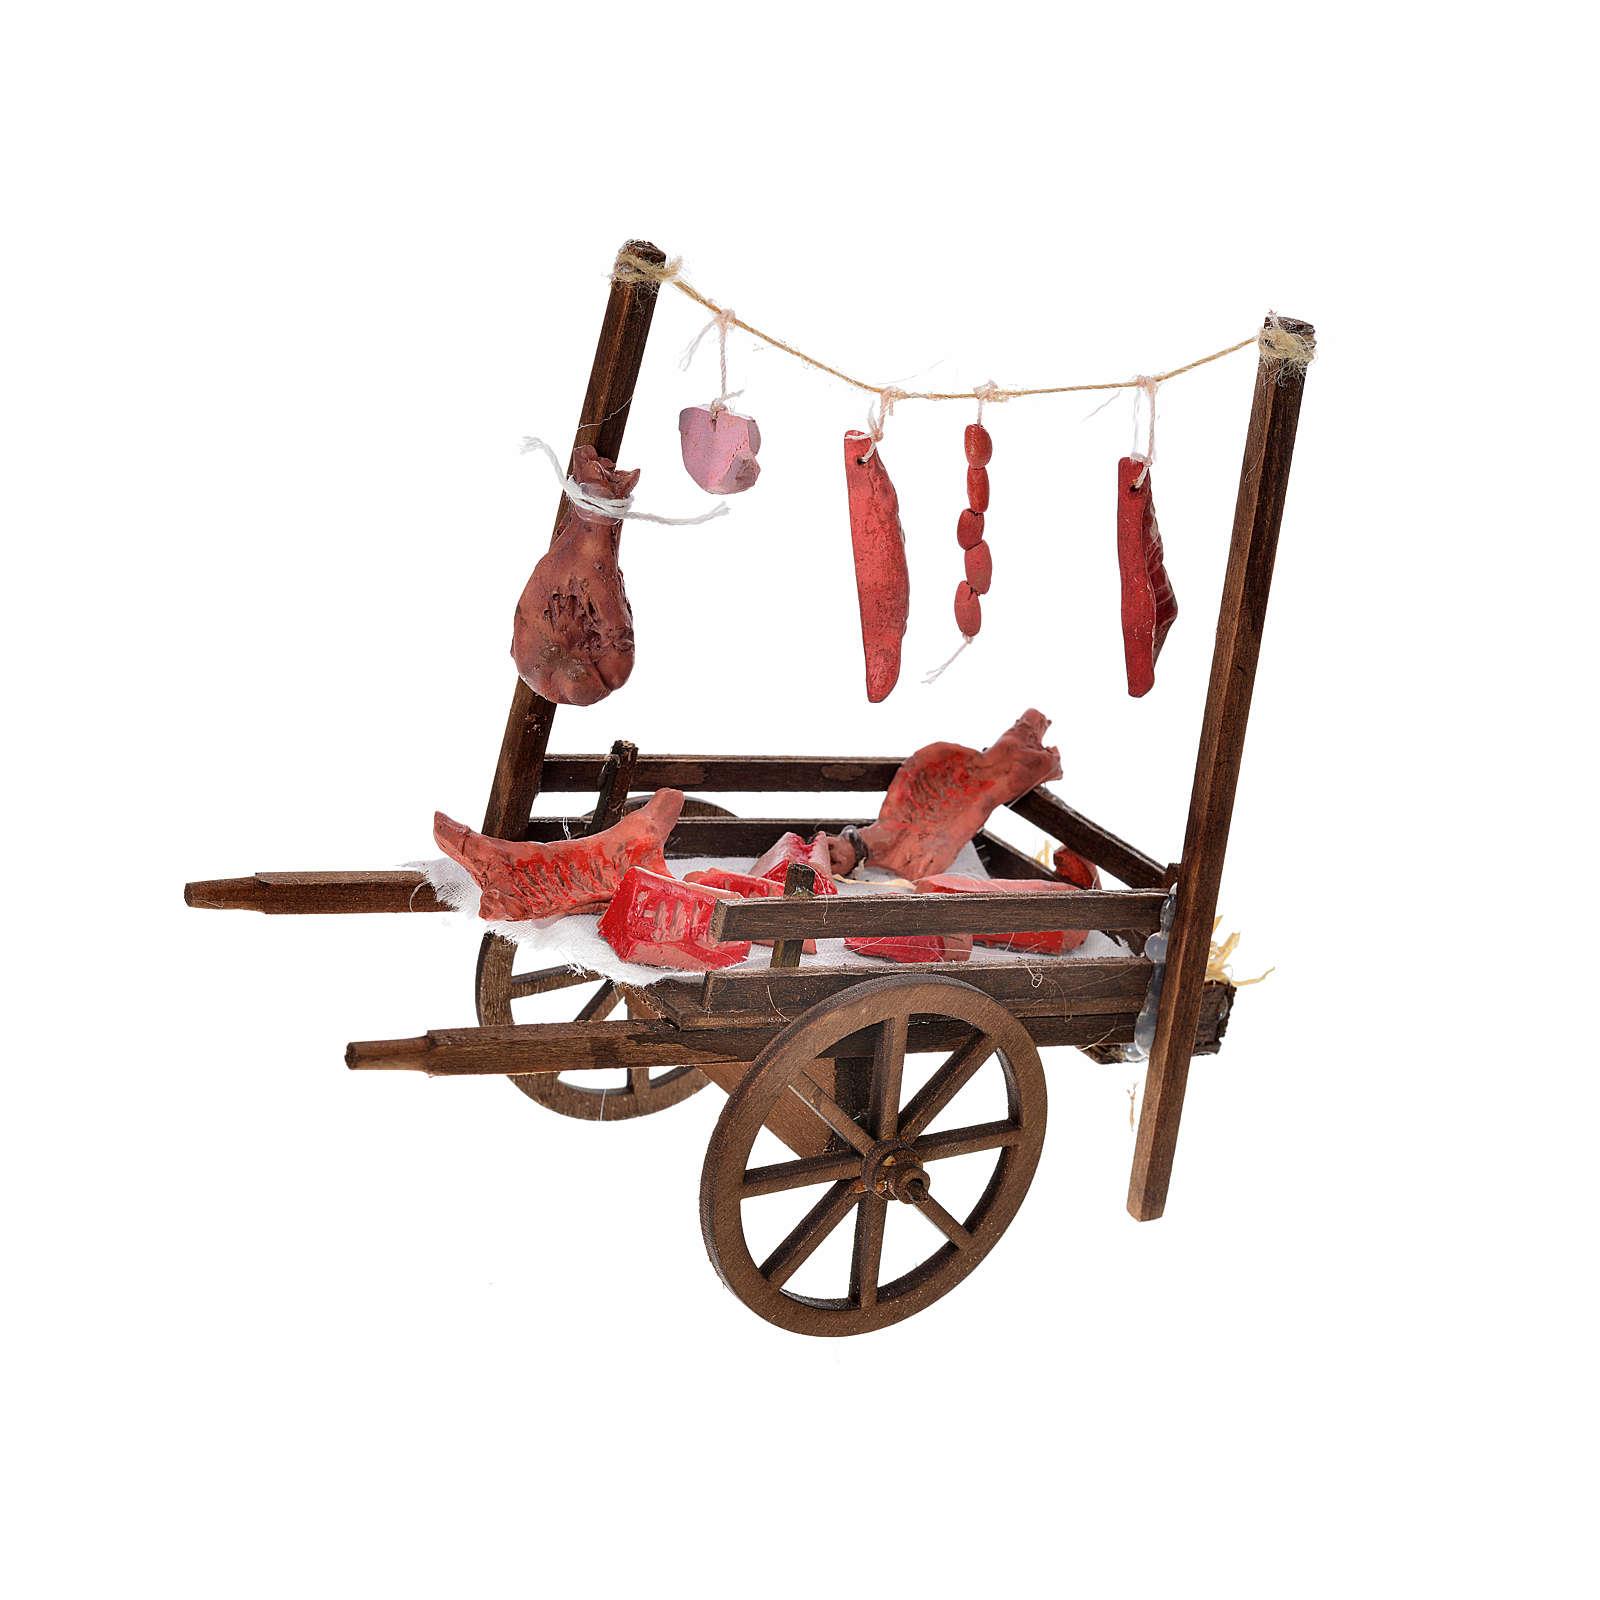 Charrette viande boucher crèche napolitaine 15x18x8 cm 4